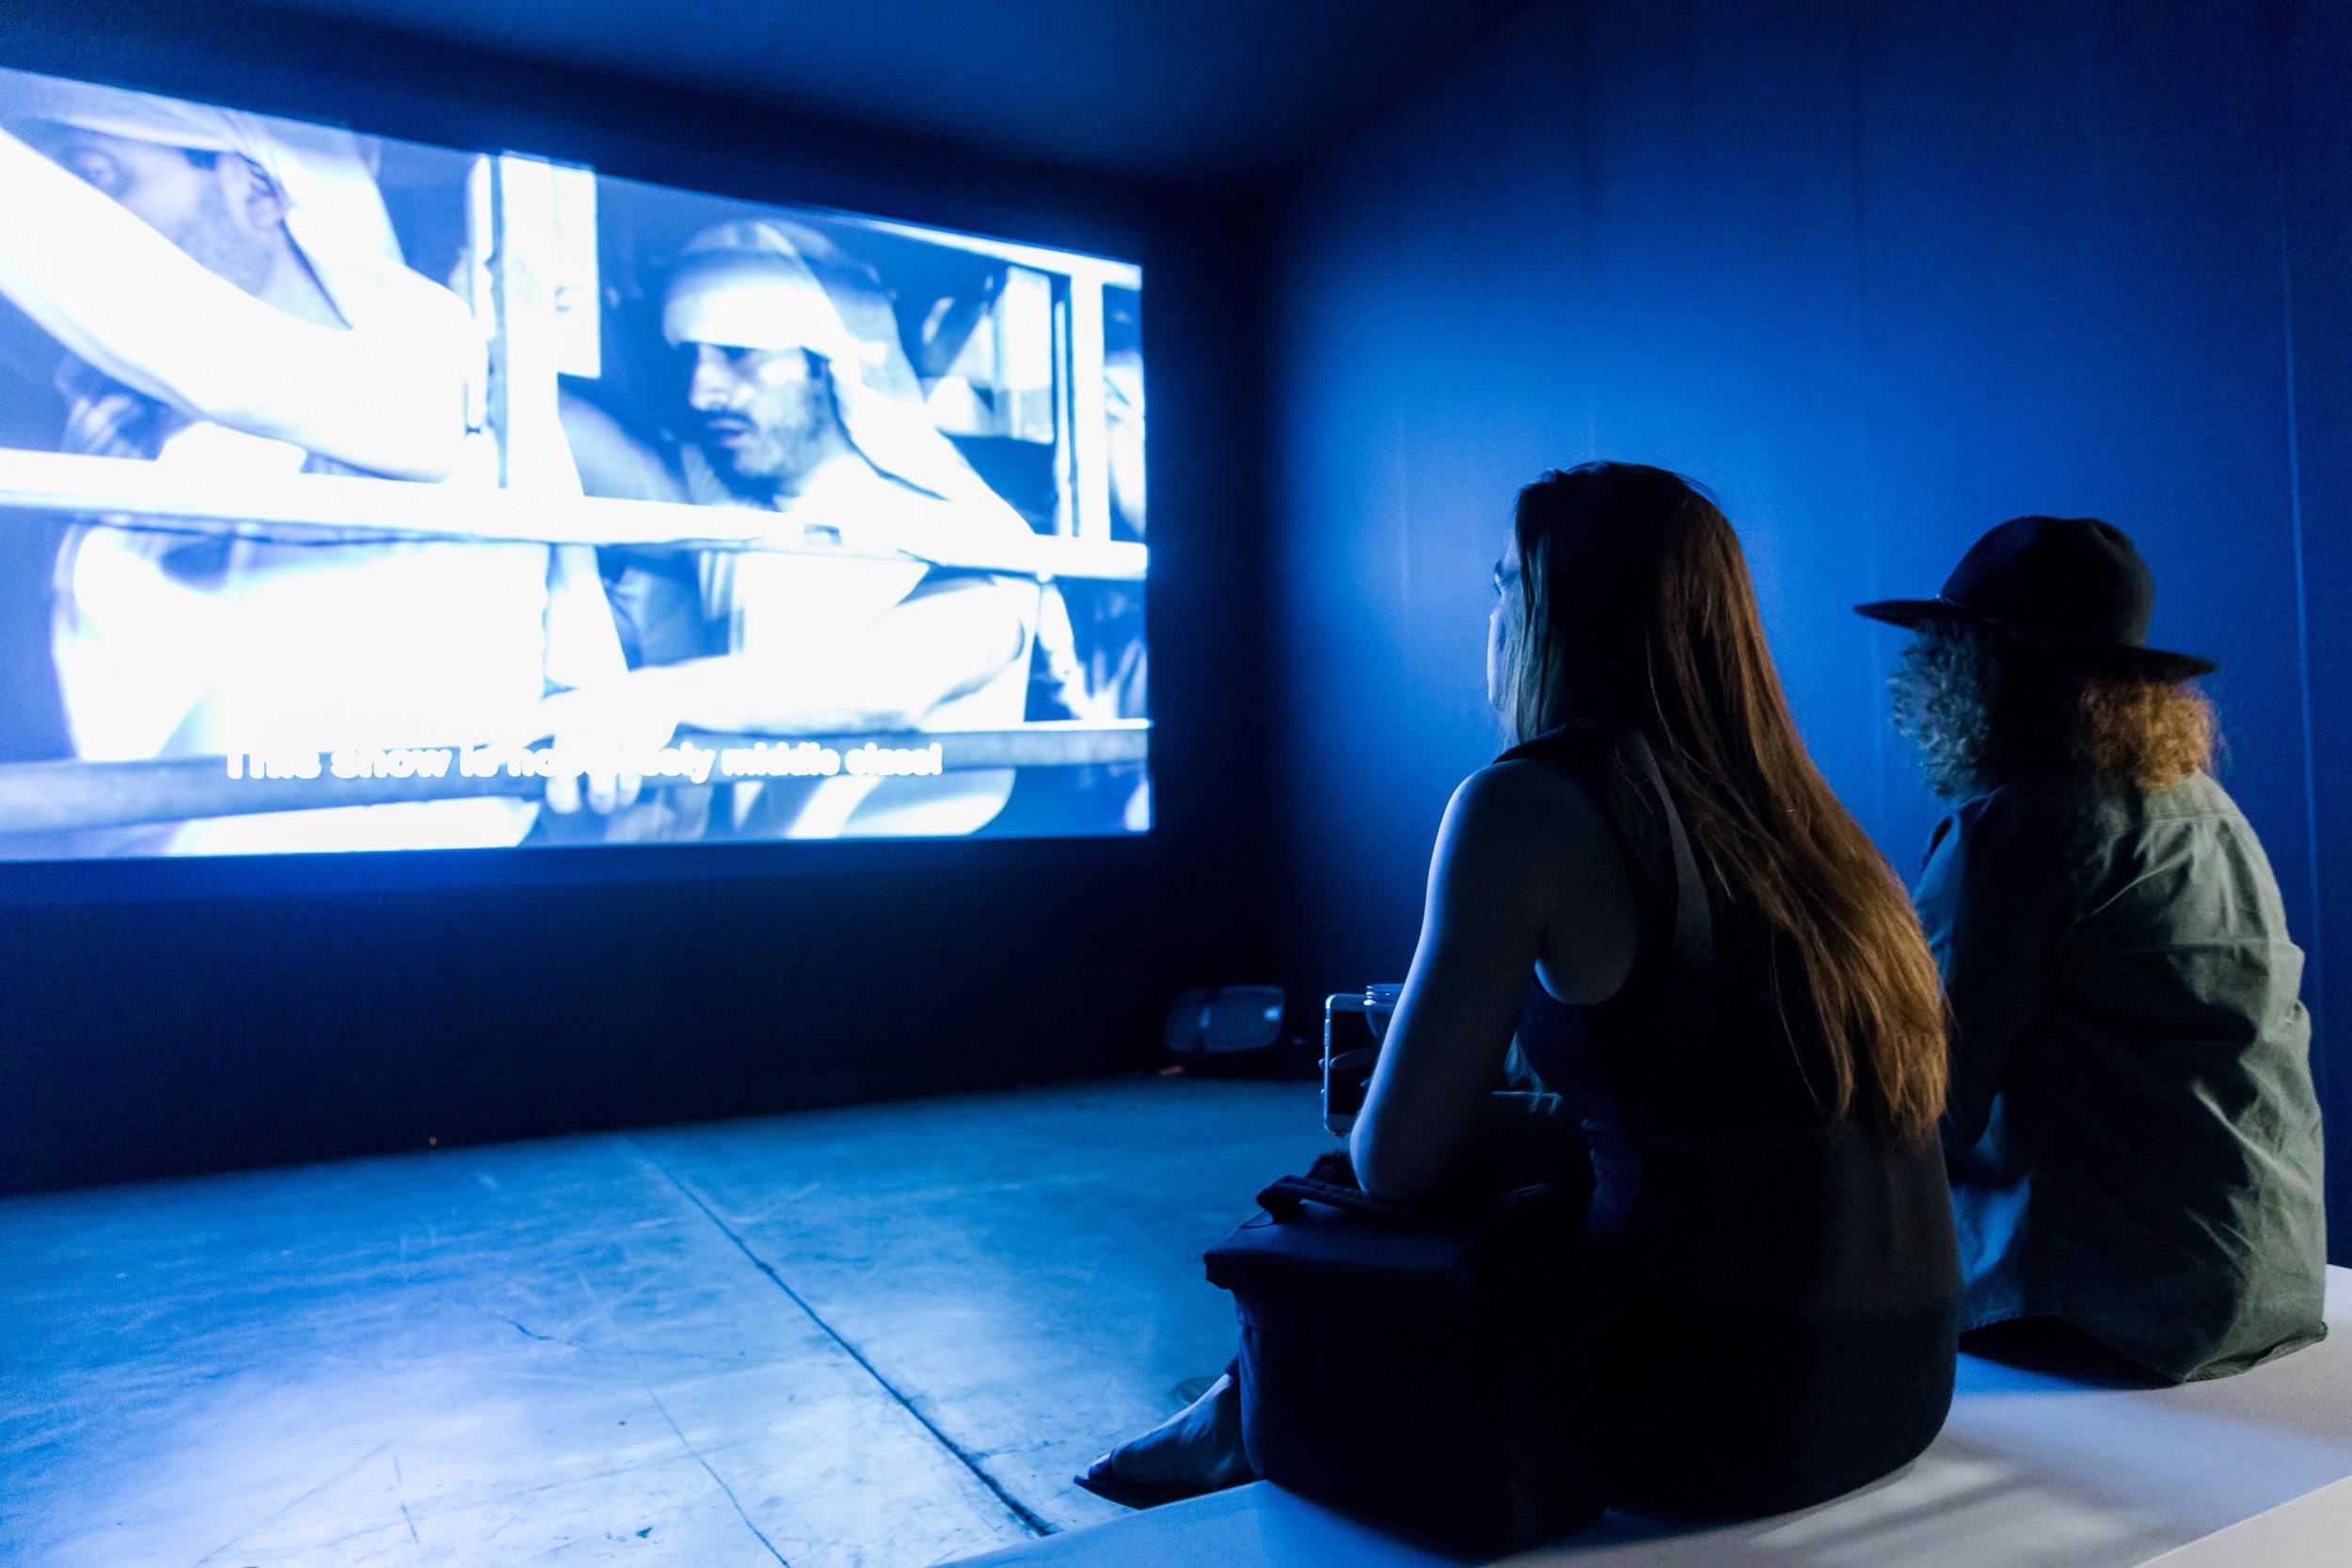 Art fair goers enjoying cinema @ Art Basel |Miami Beach 2015  © Art Basel